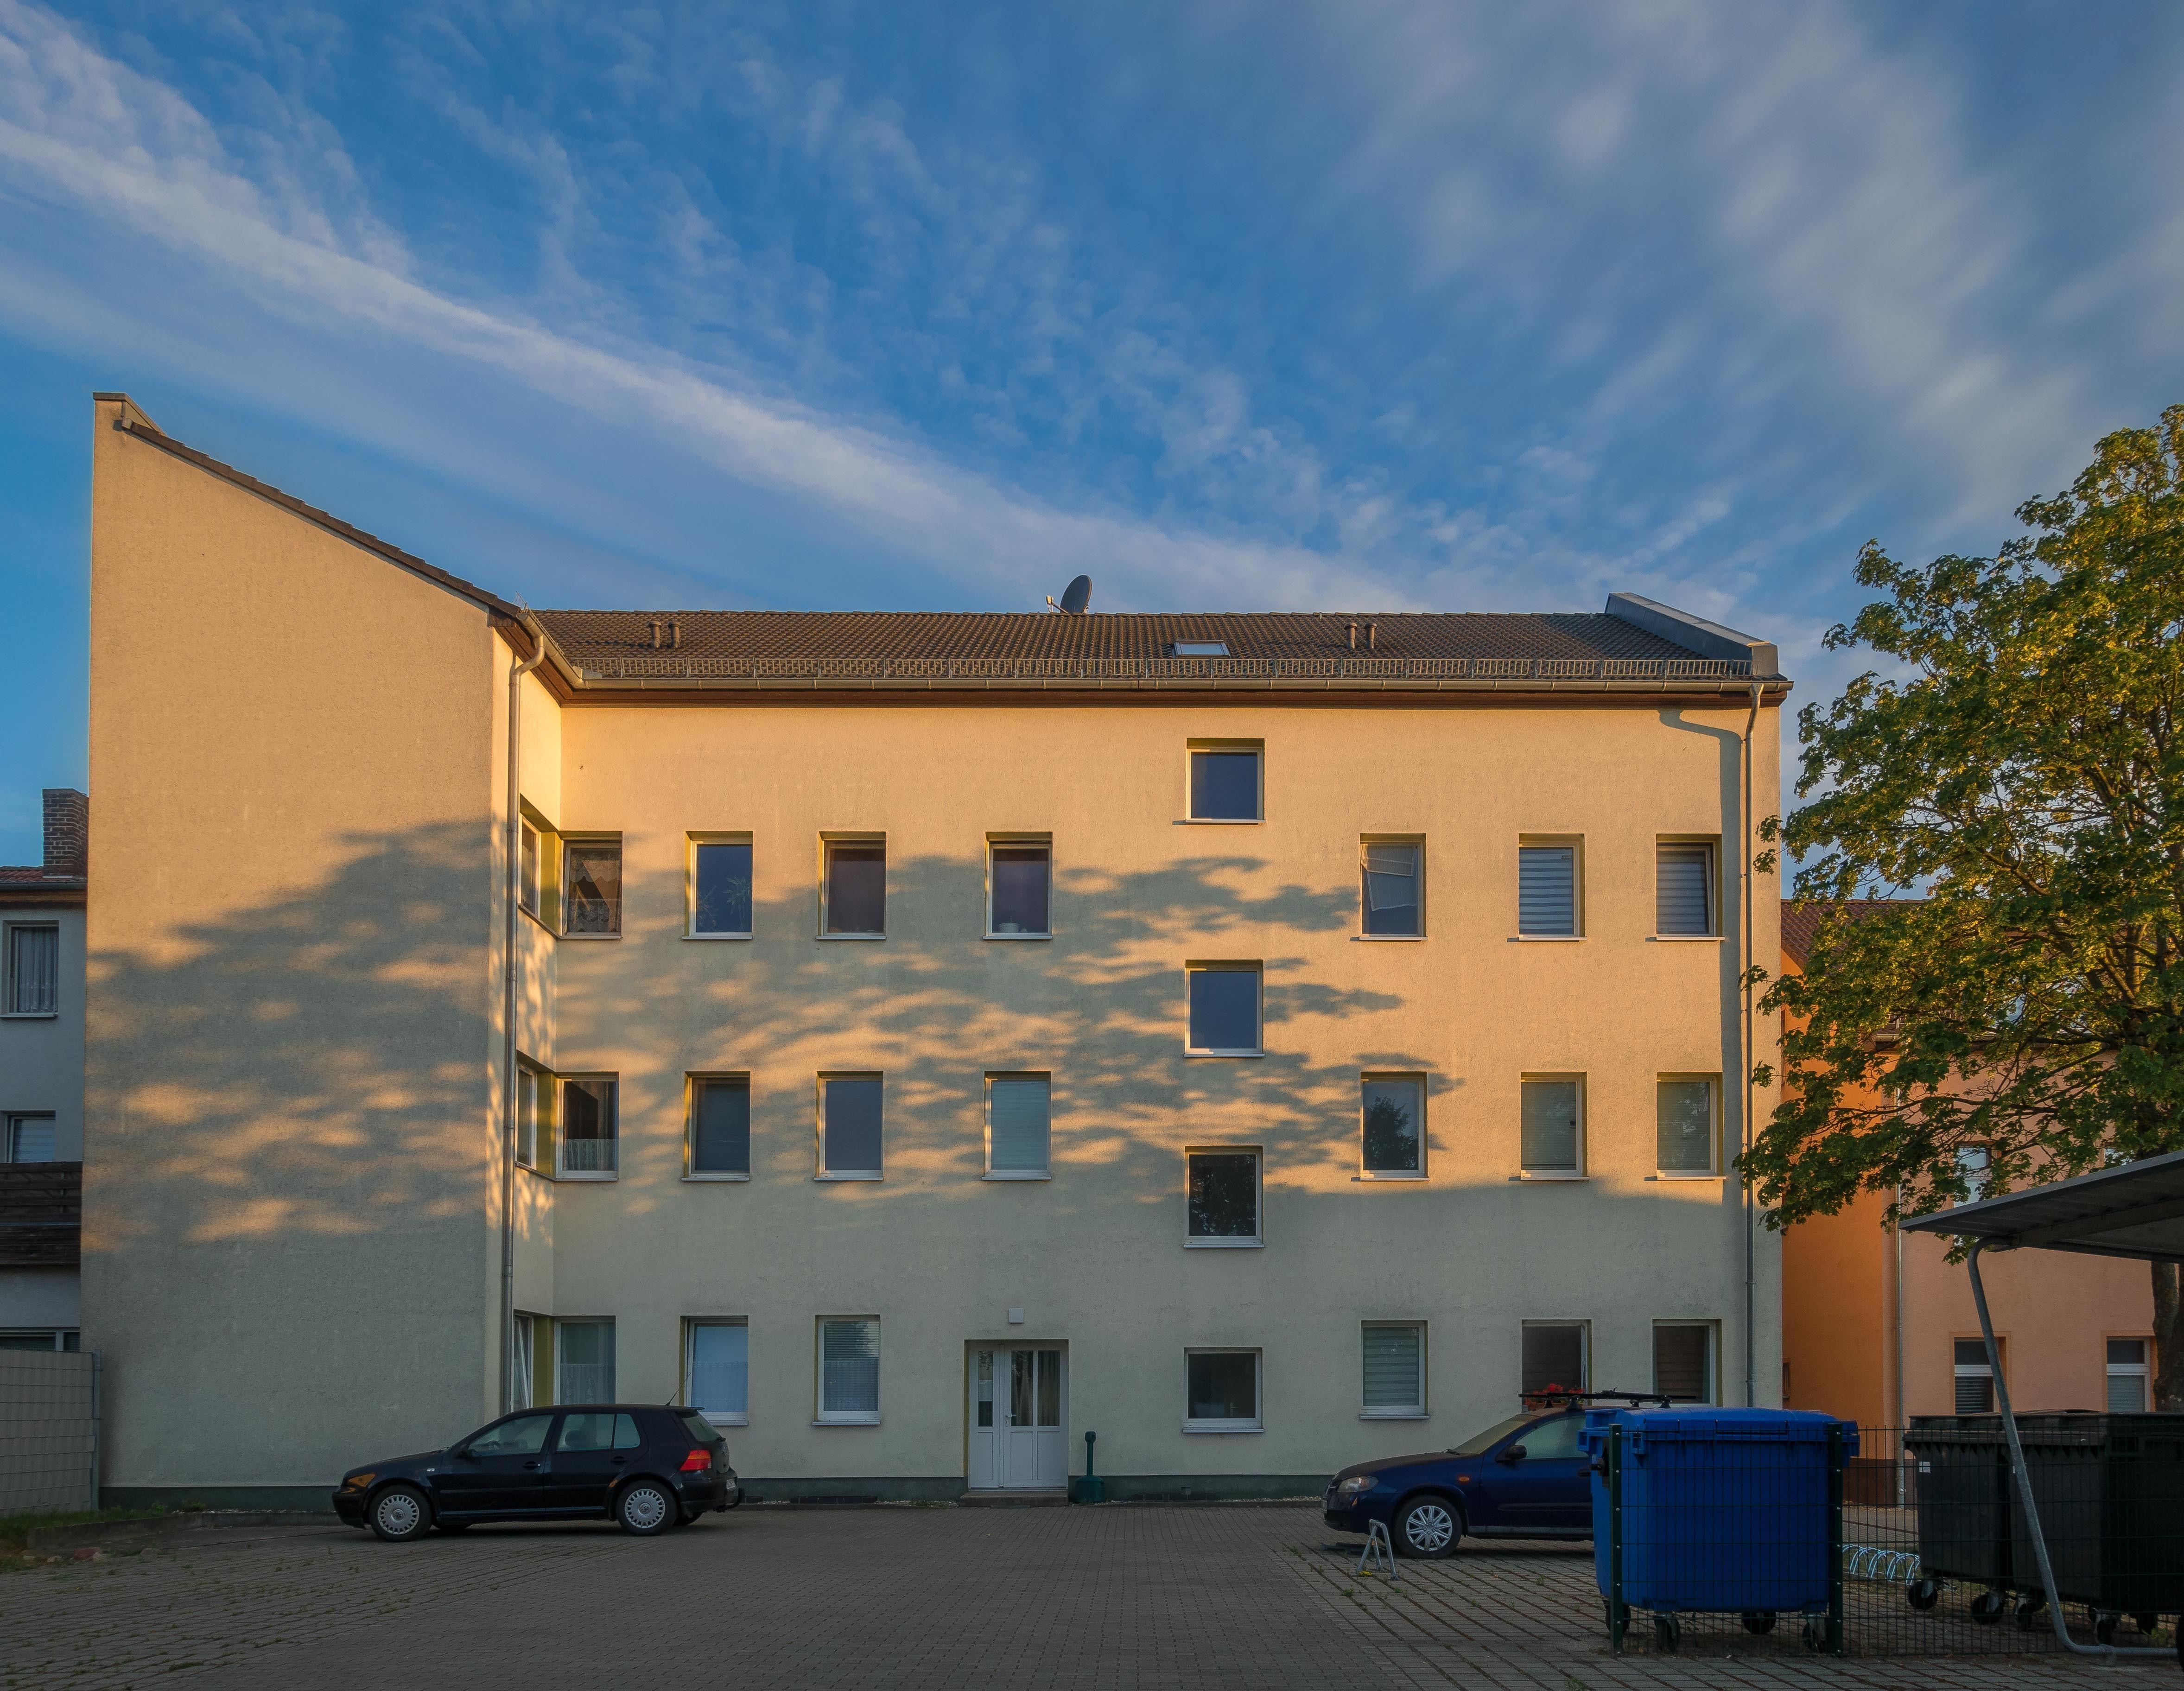 E.-Thälmann-Str. 86